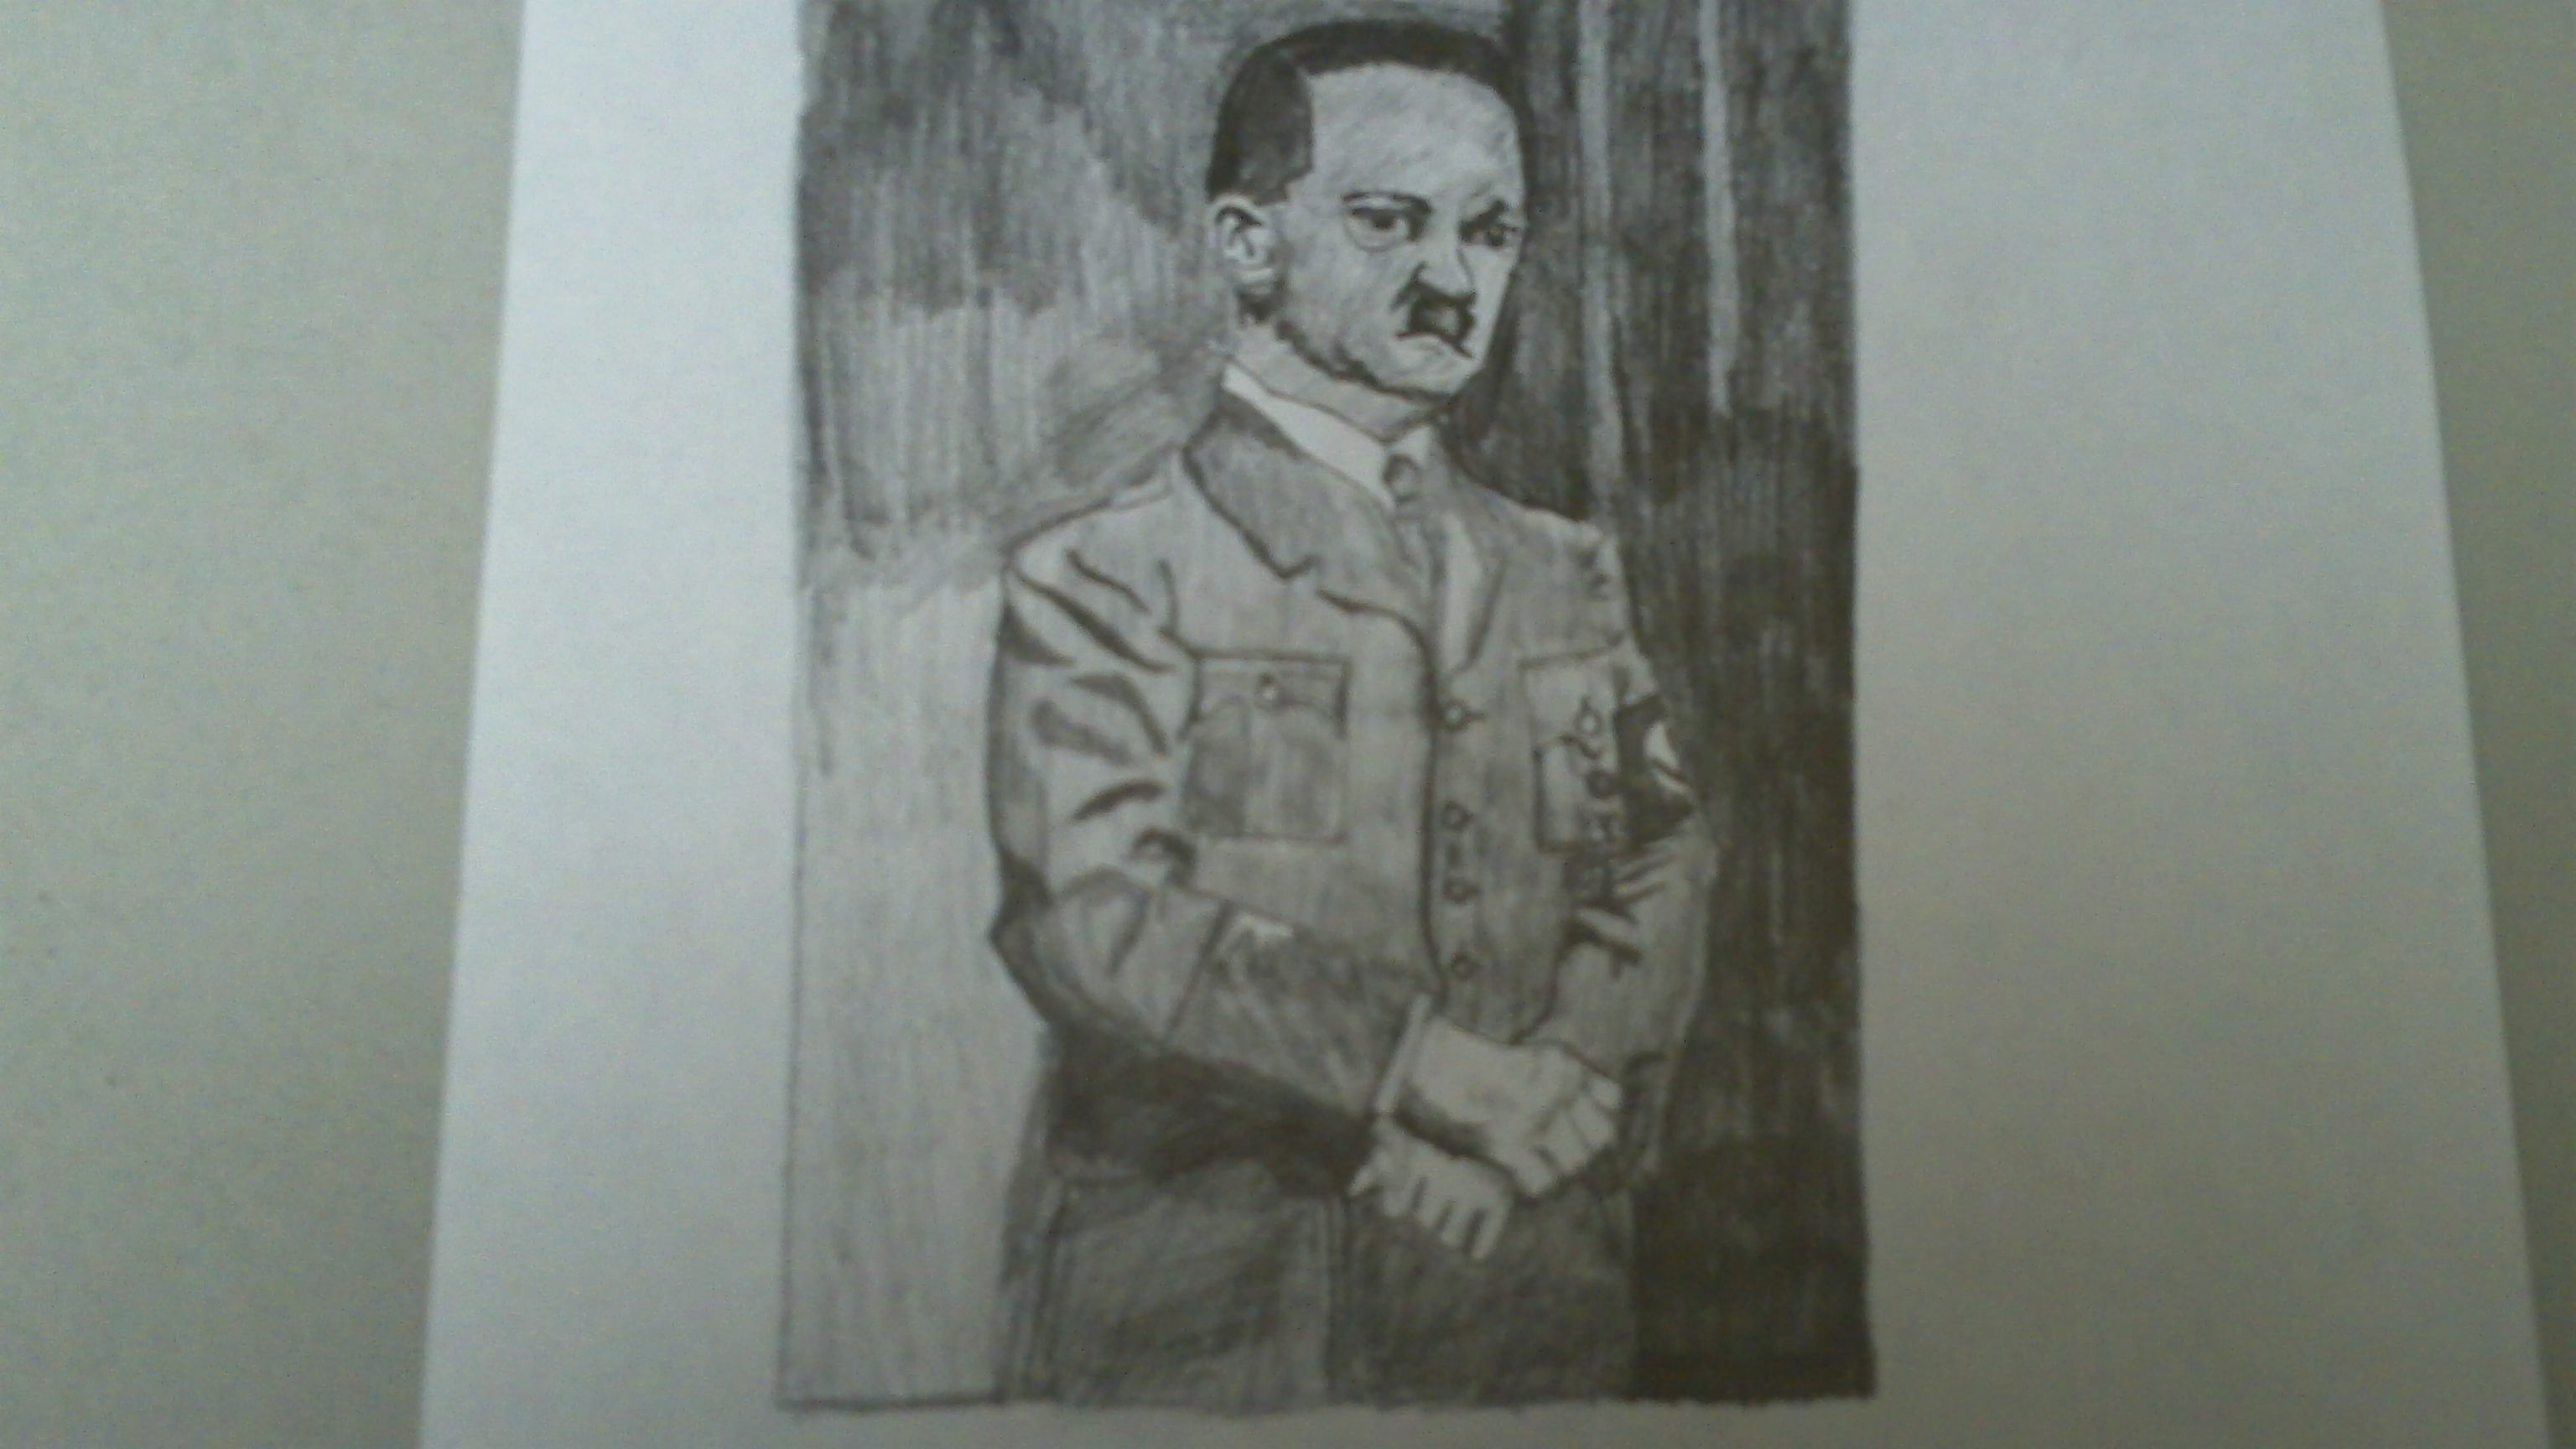 The Fuhrer Himself